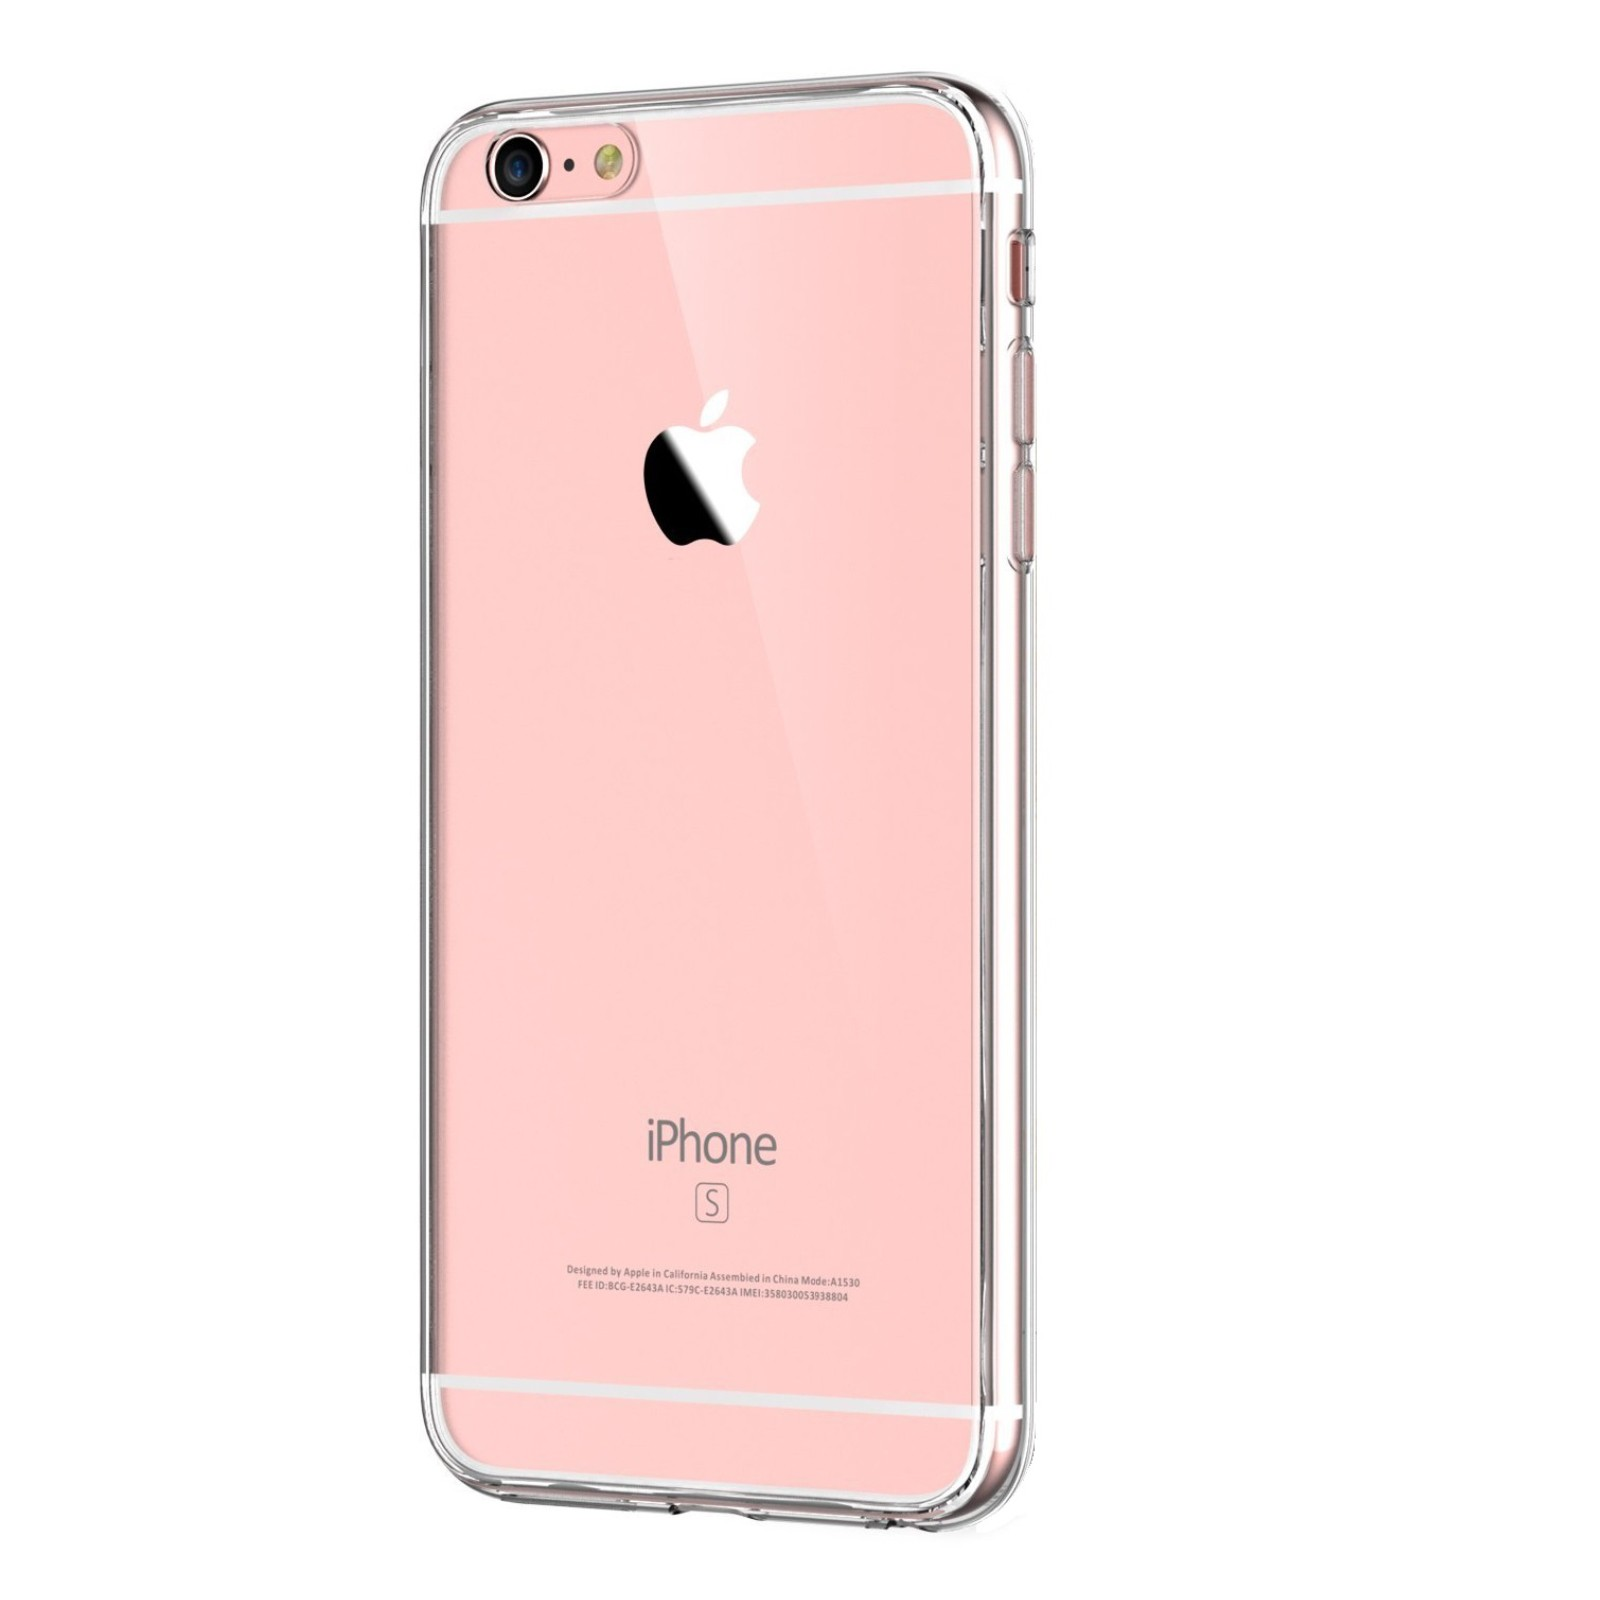 732d0a723b8 Funda de gel TPU carcasa protectora silicona para Apple Iphone 6  Transparente